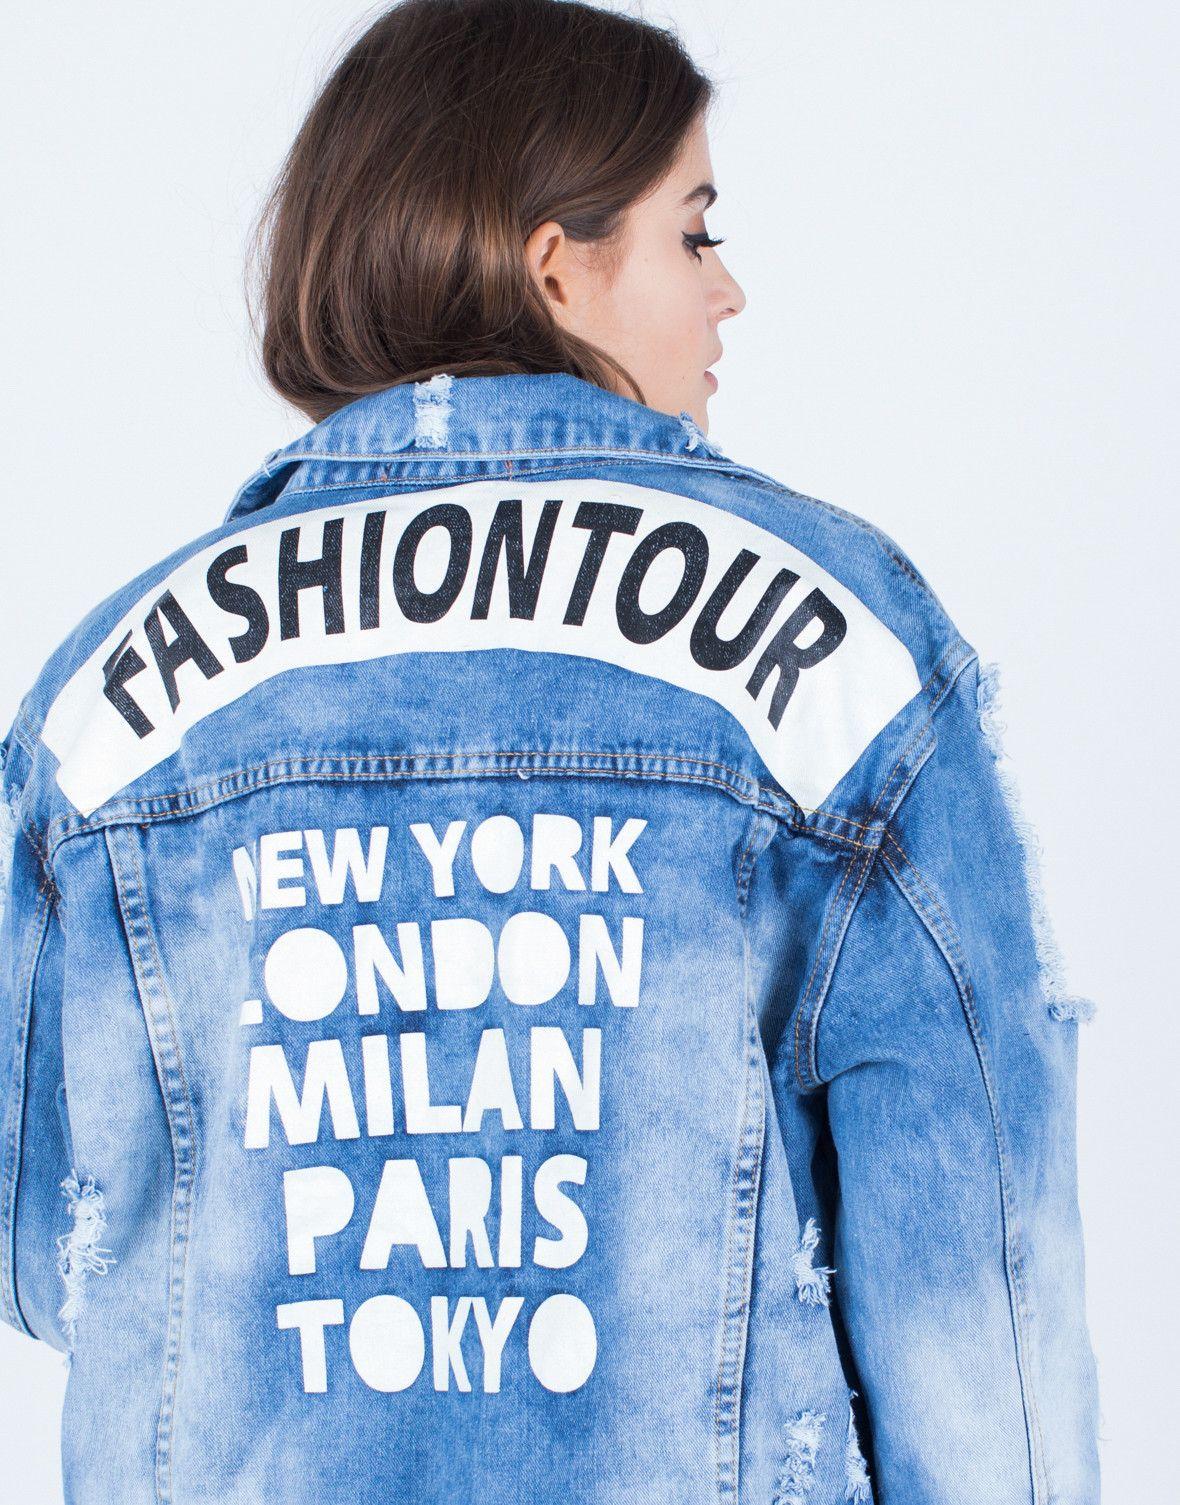 Fashion Tour Denim Jacket   Fashion, Denim t shirt, Stylish